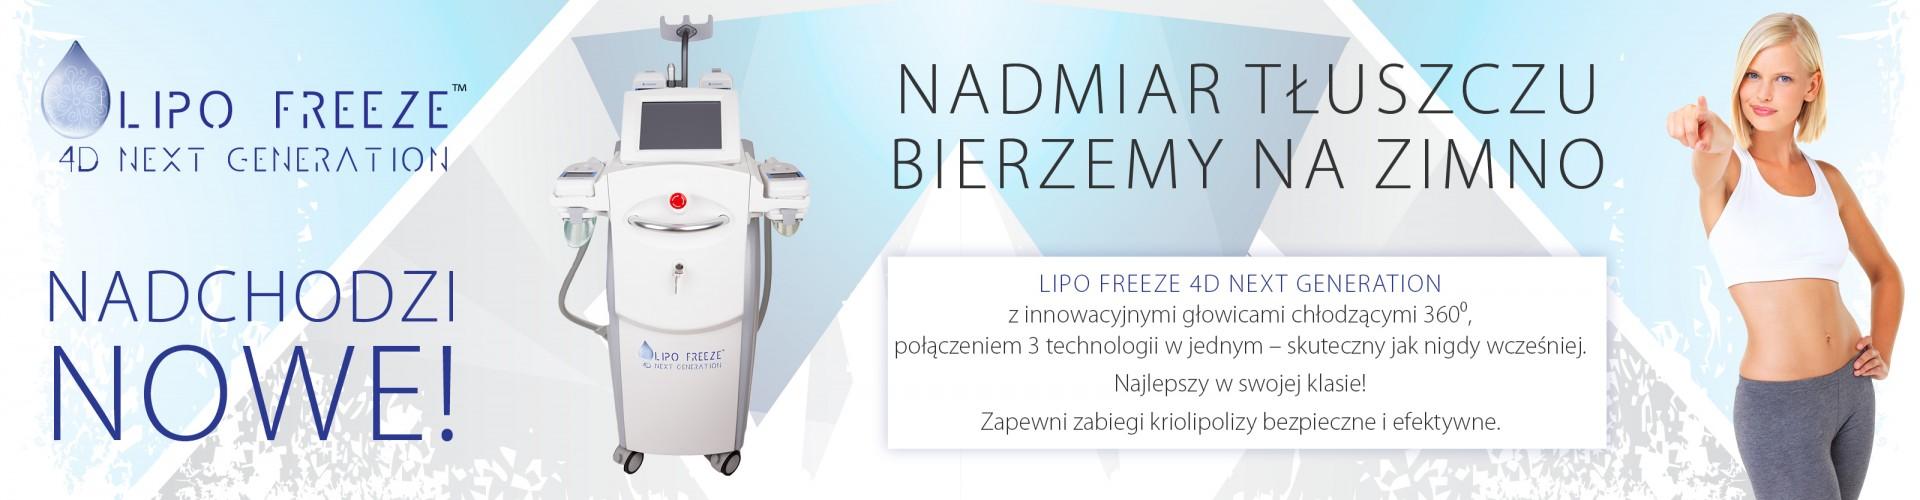 lipofreeze4D